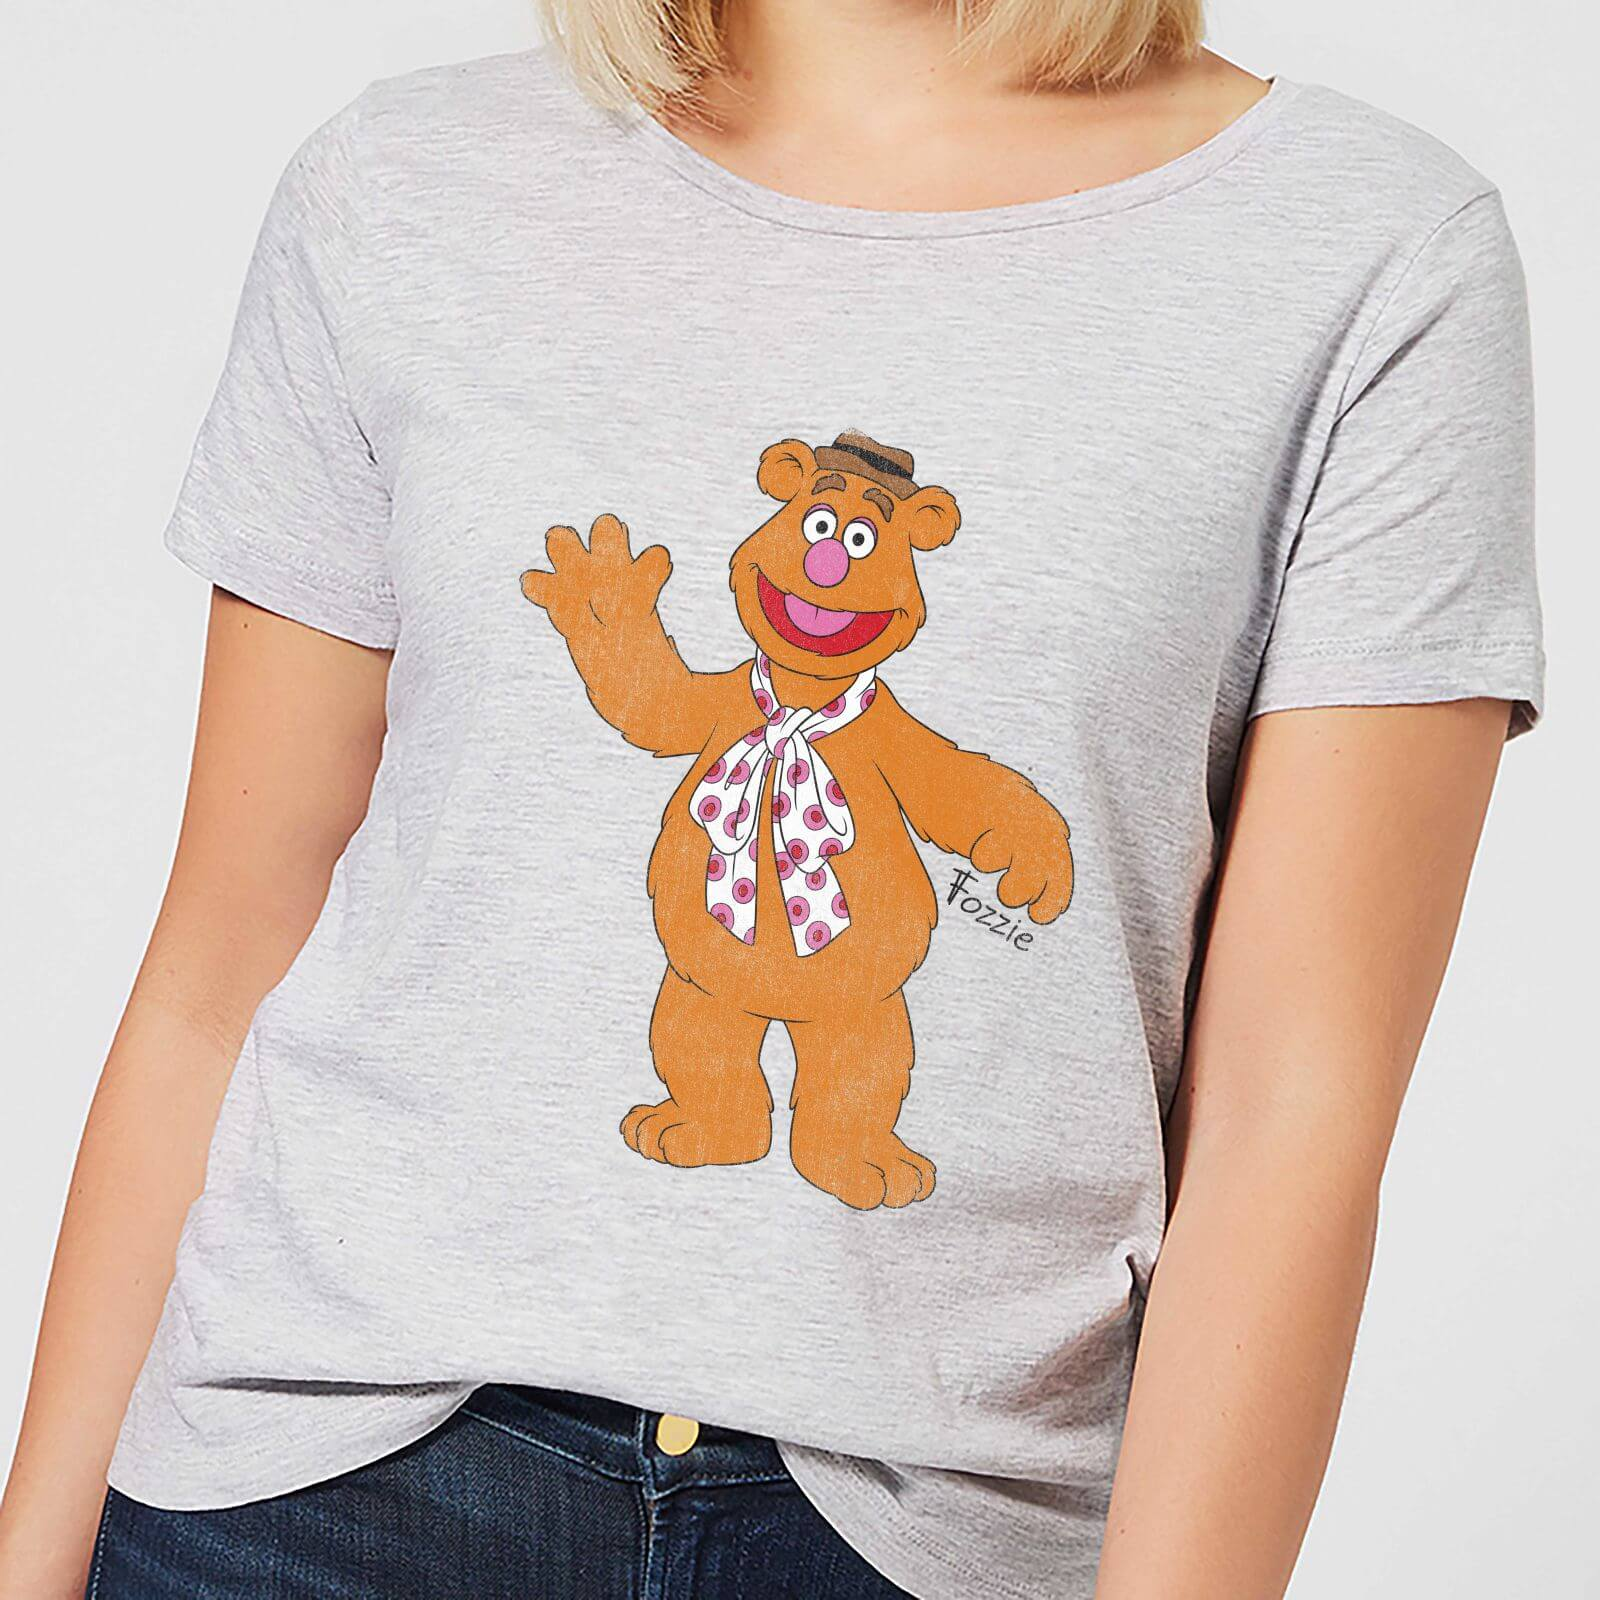 Disney Muppets Fozzie Bear Classic Womens T Shirt Grey Clothing Cardinal Girl Navy Xl Description